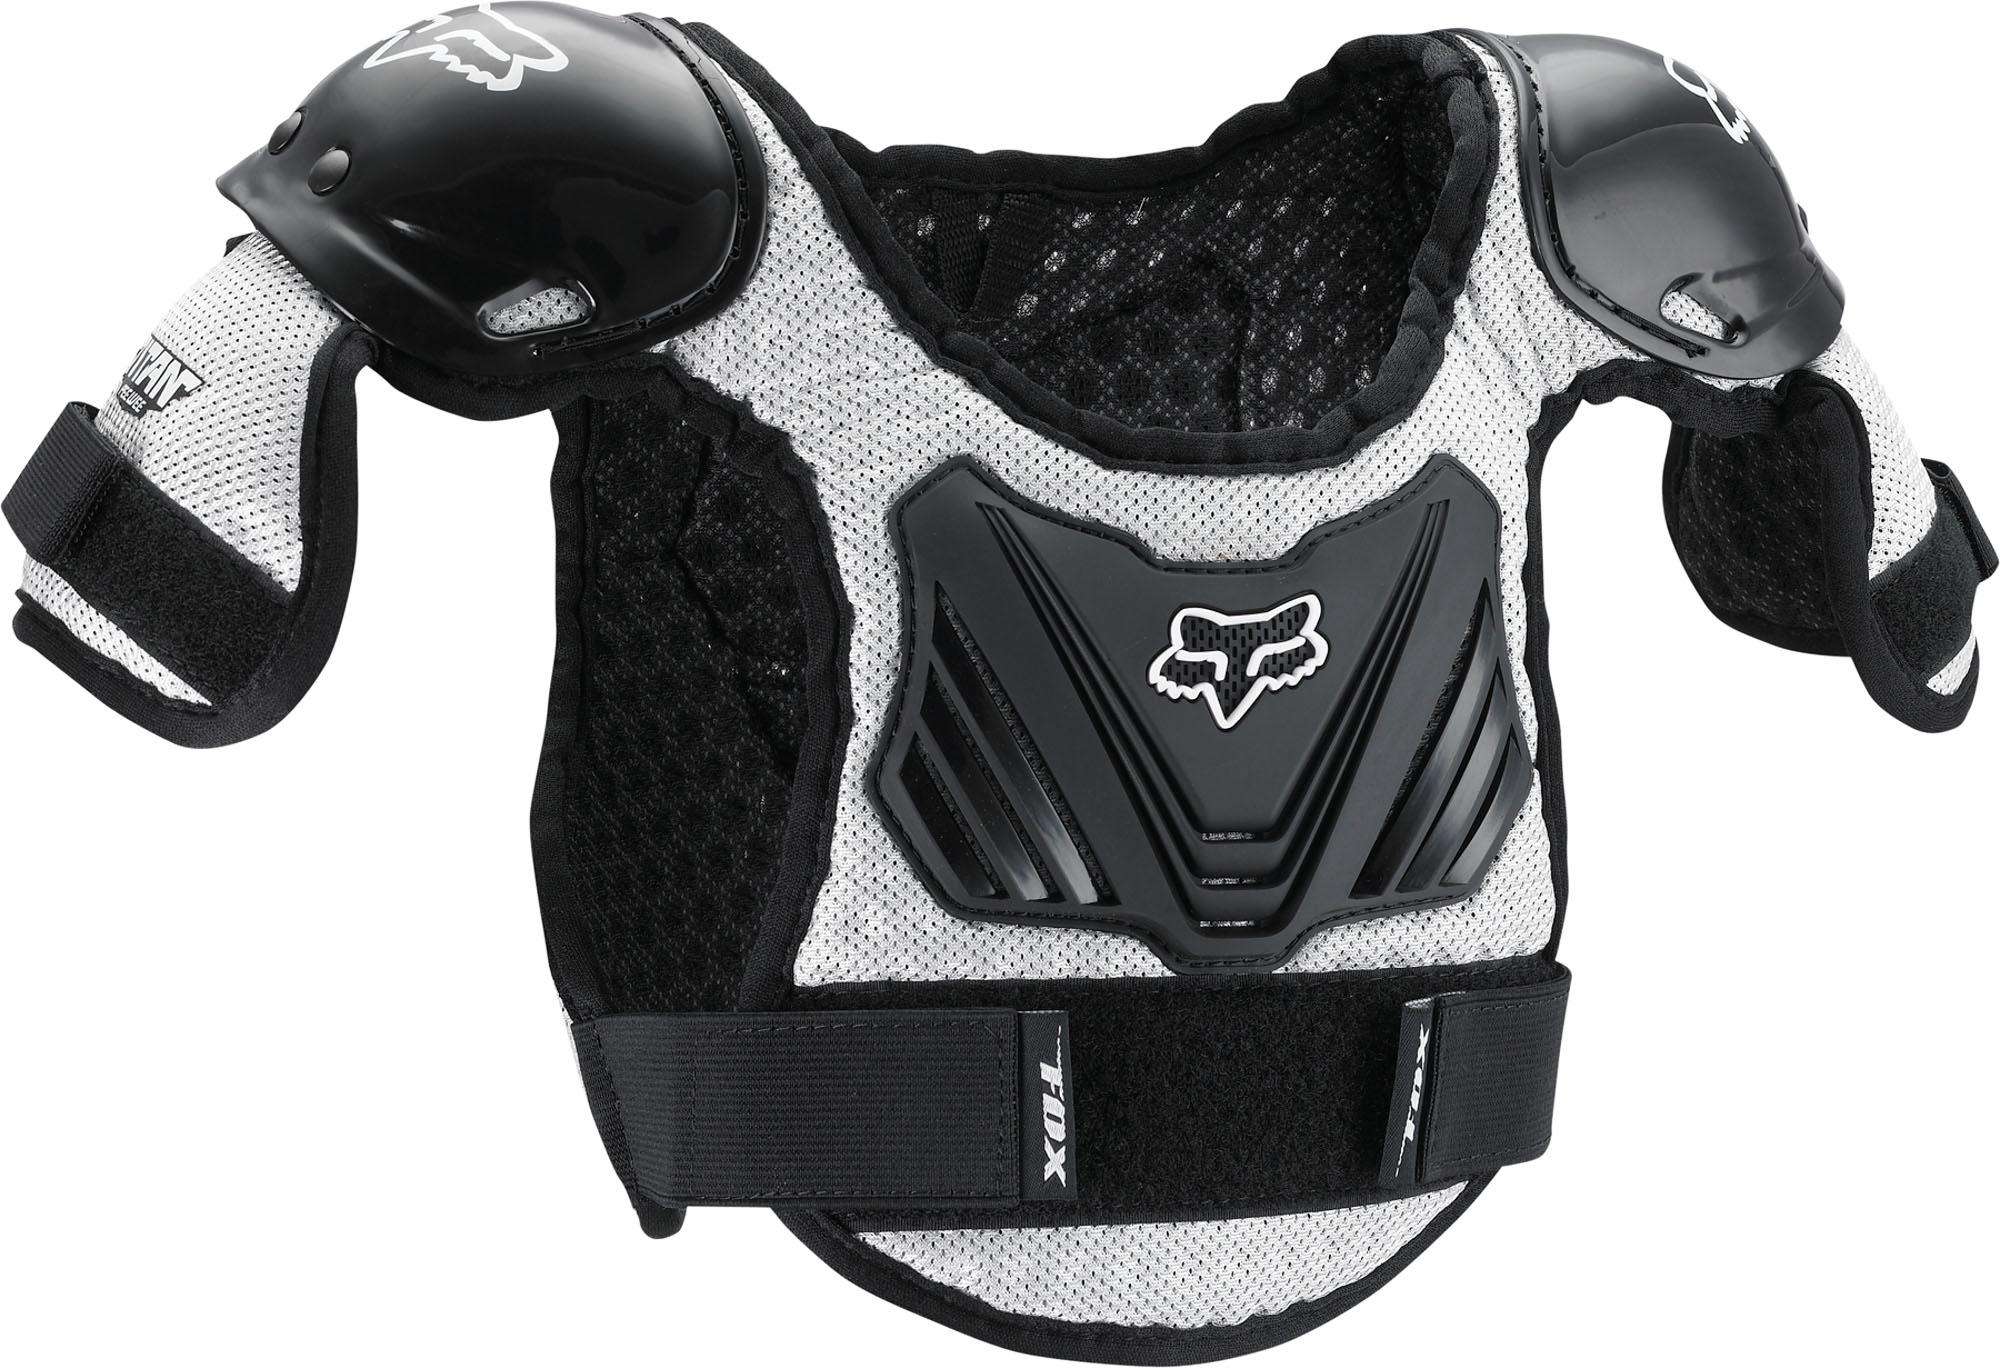 FOX Peewee Titan Roost Defle - Black/Silver MX22